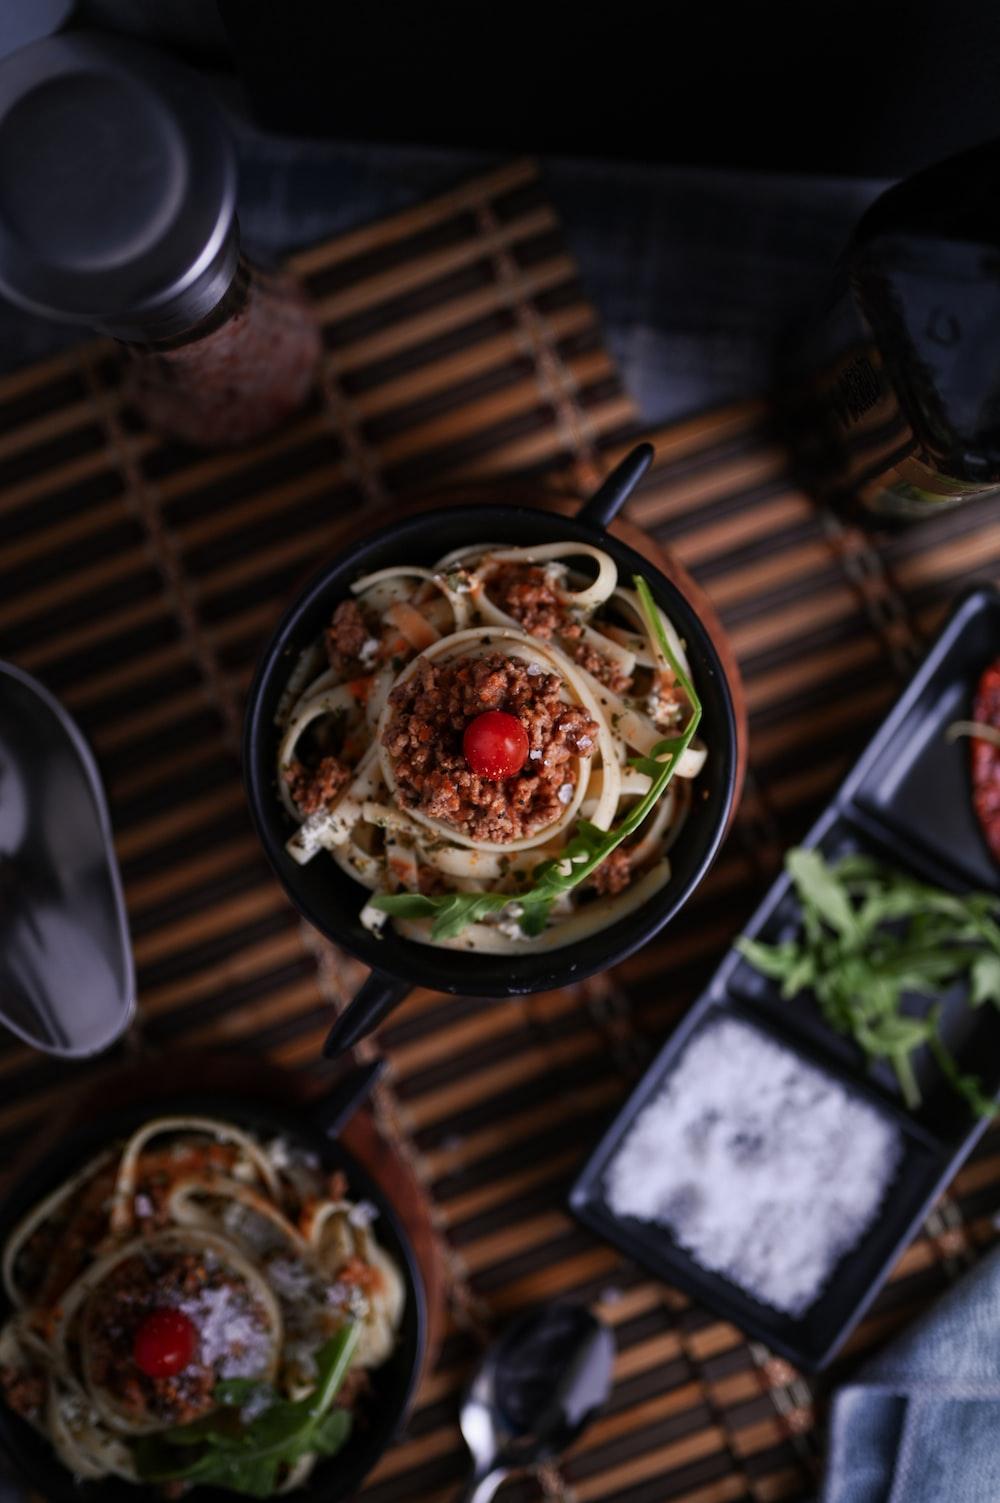 black bowl with food near sauce bowl